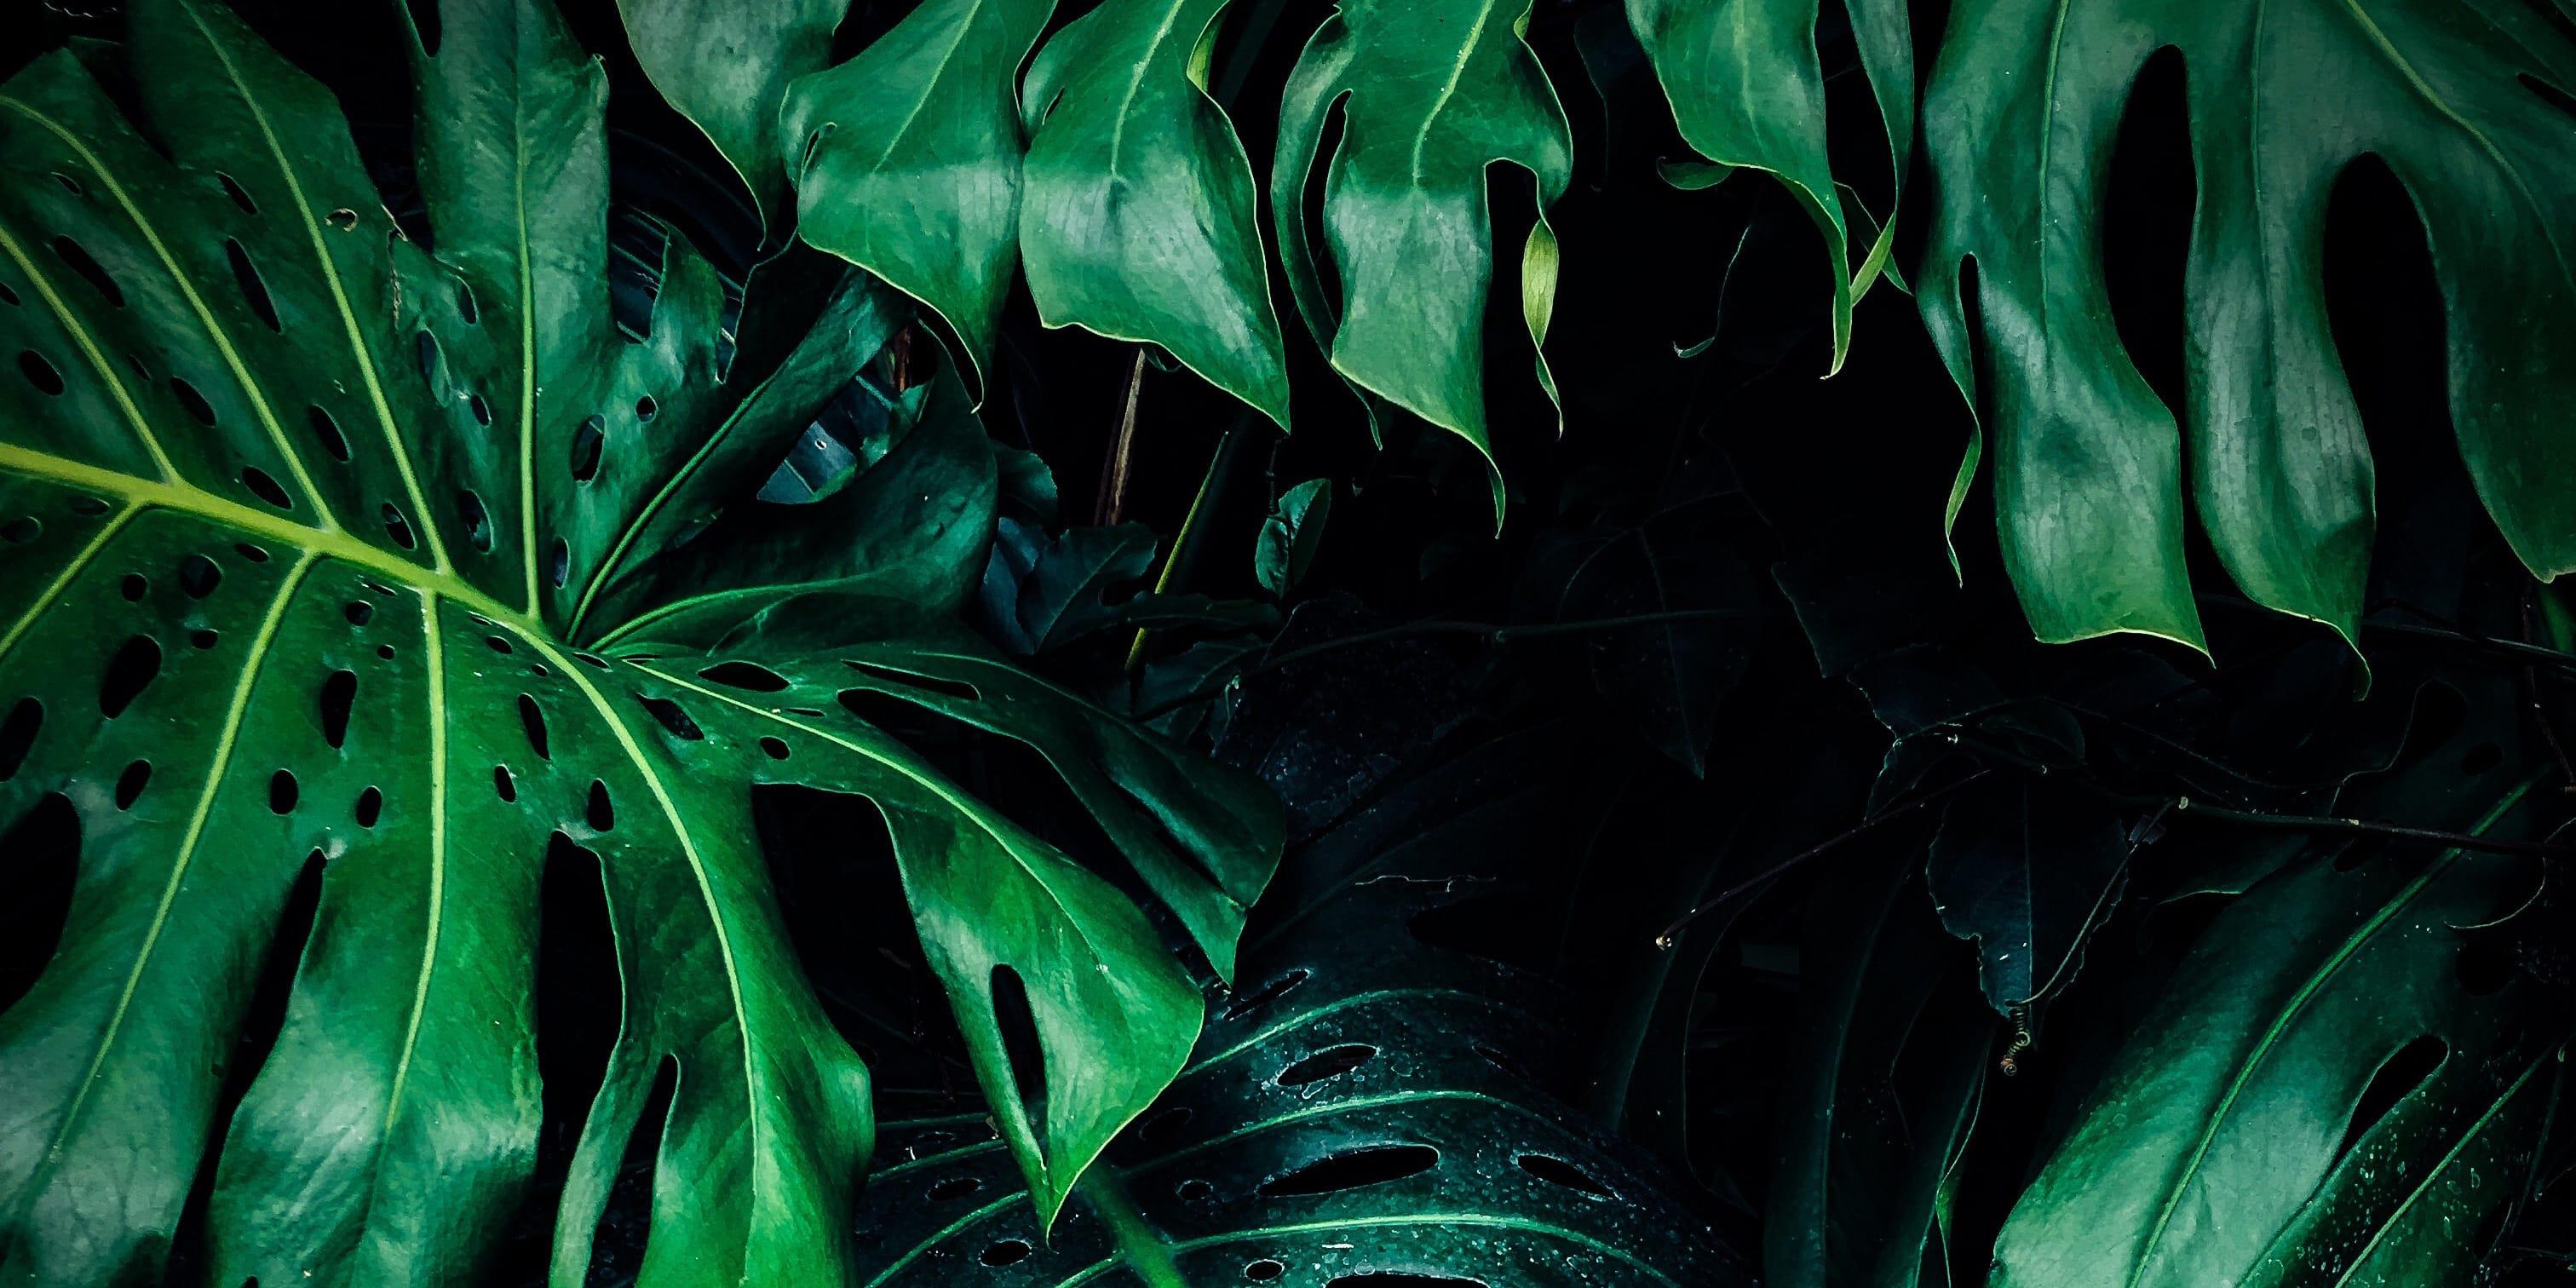 deep green wild plant